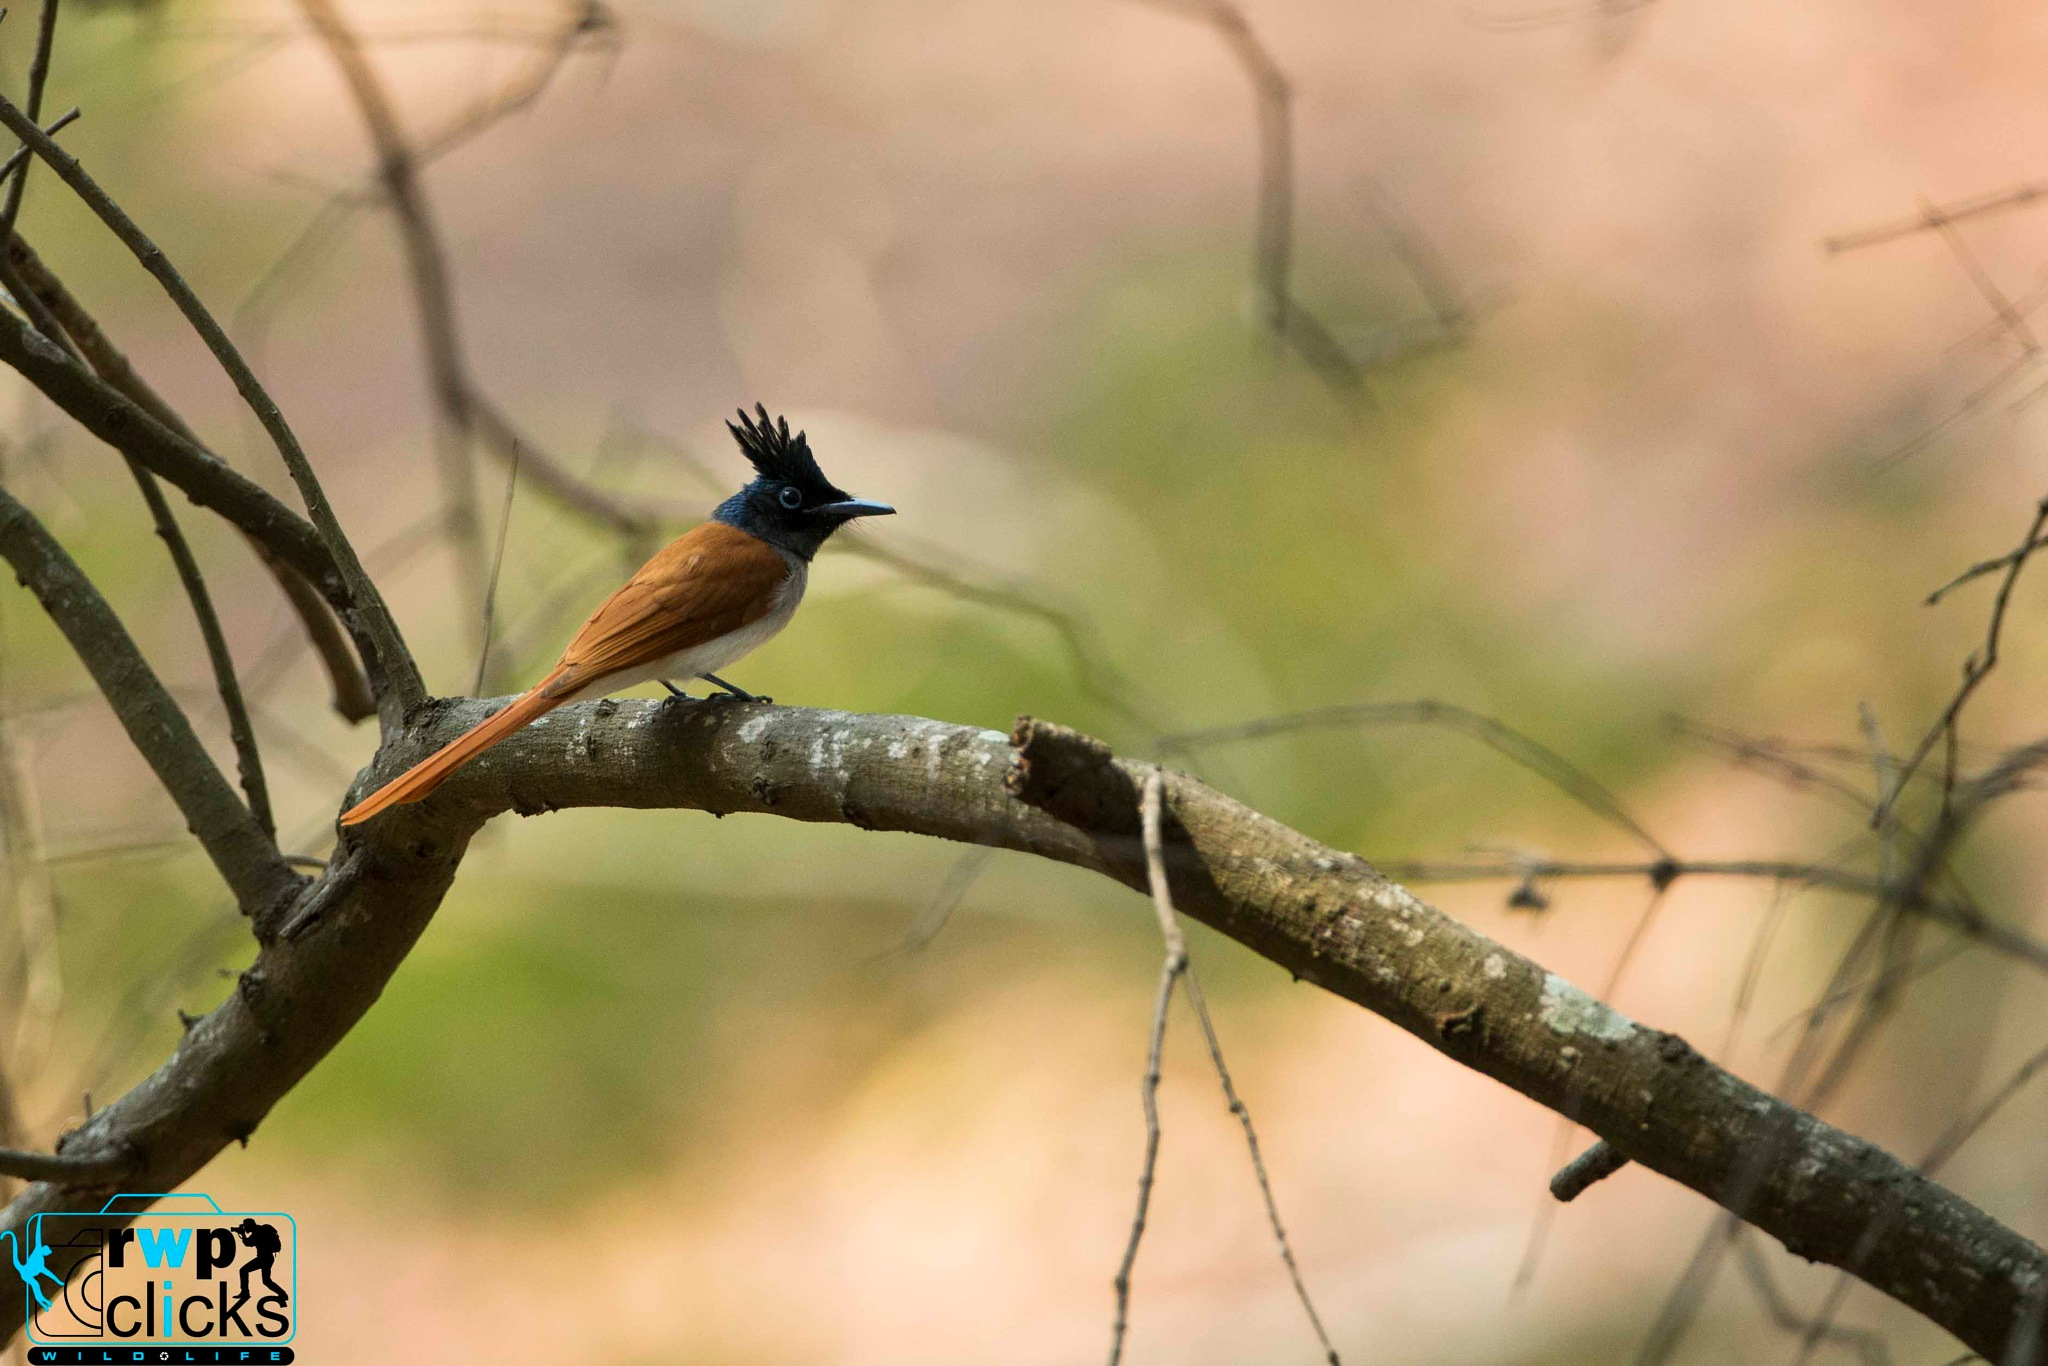 Paradise fly catcher  by Rajesh W. Pereira